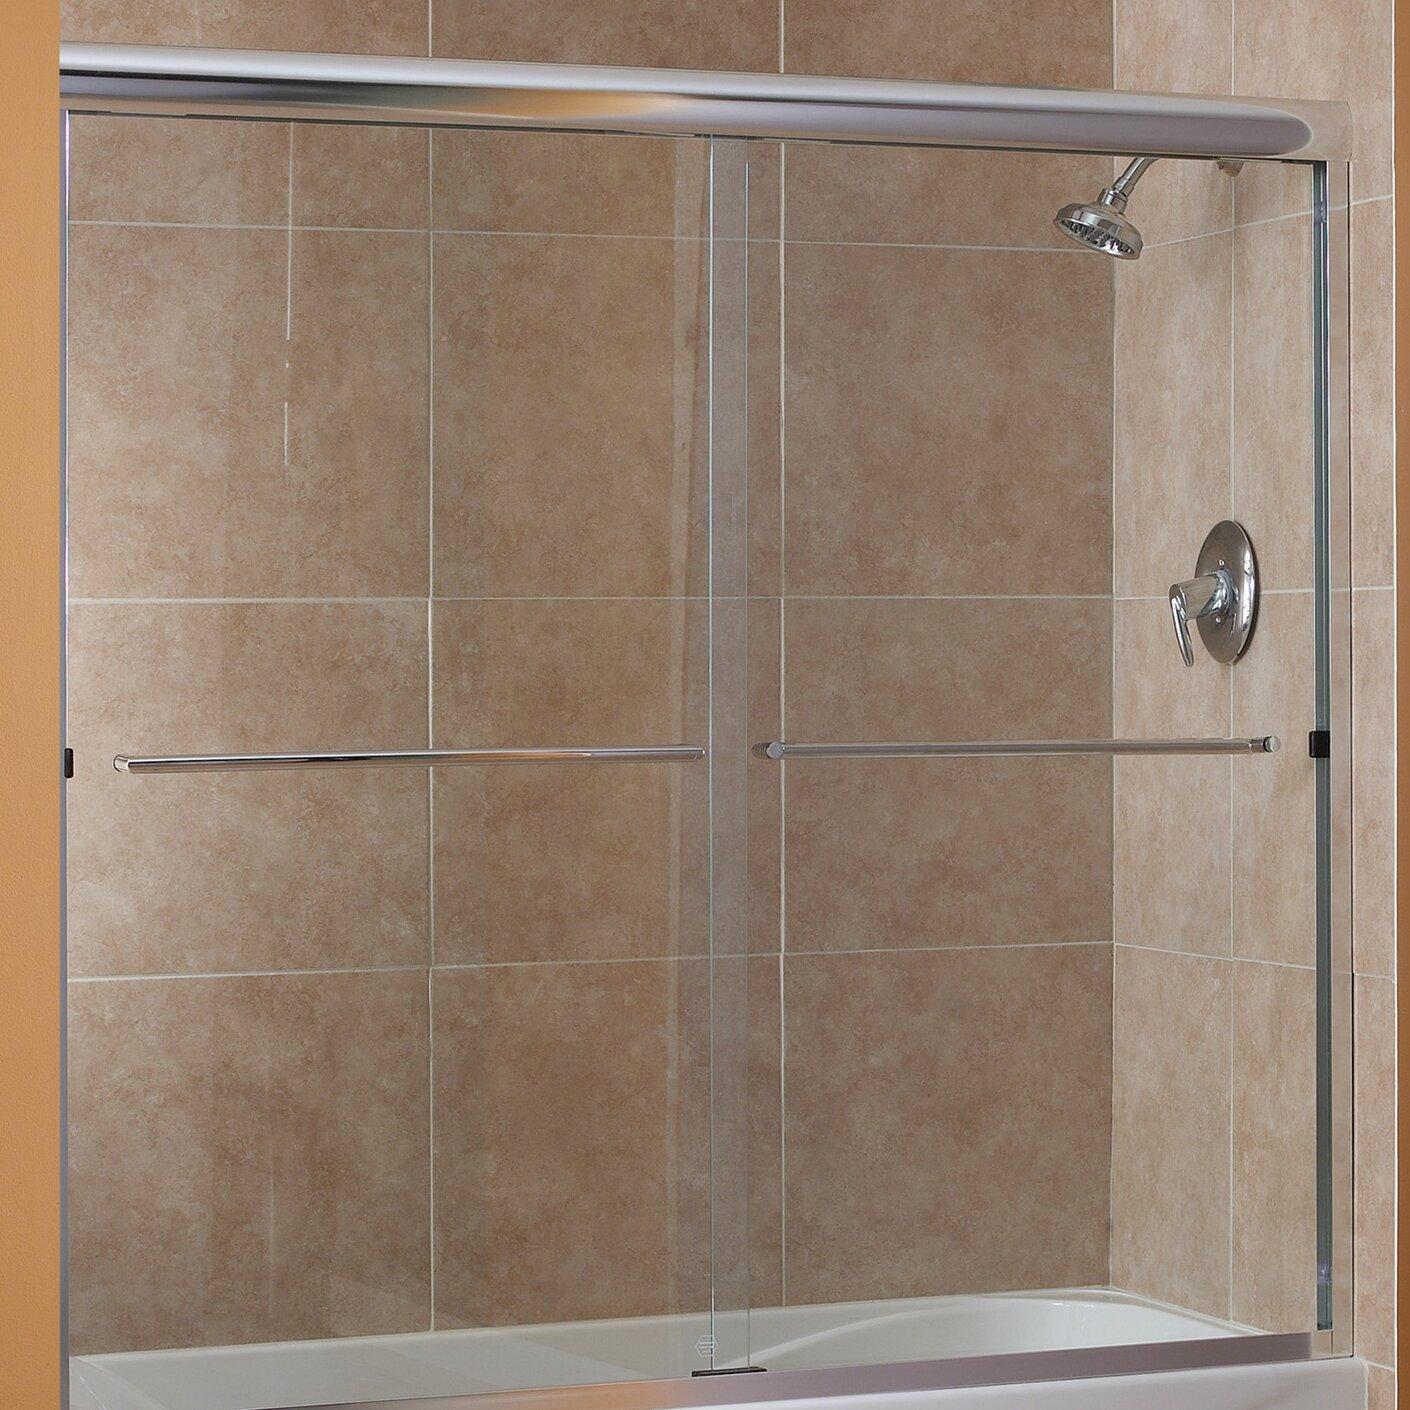 Foremost cove 55 x 50 54 frameless sliding tub door for Door 55 reviews